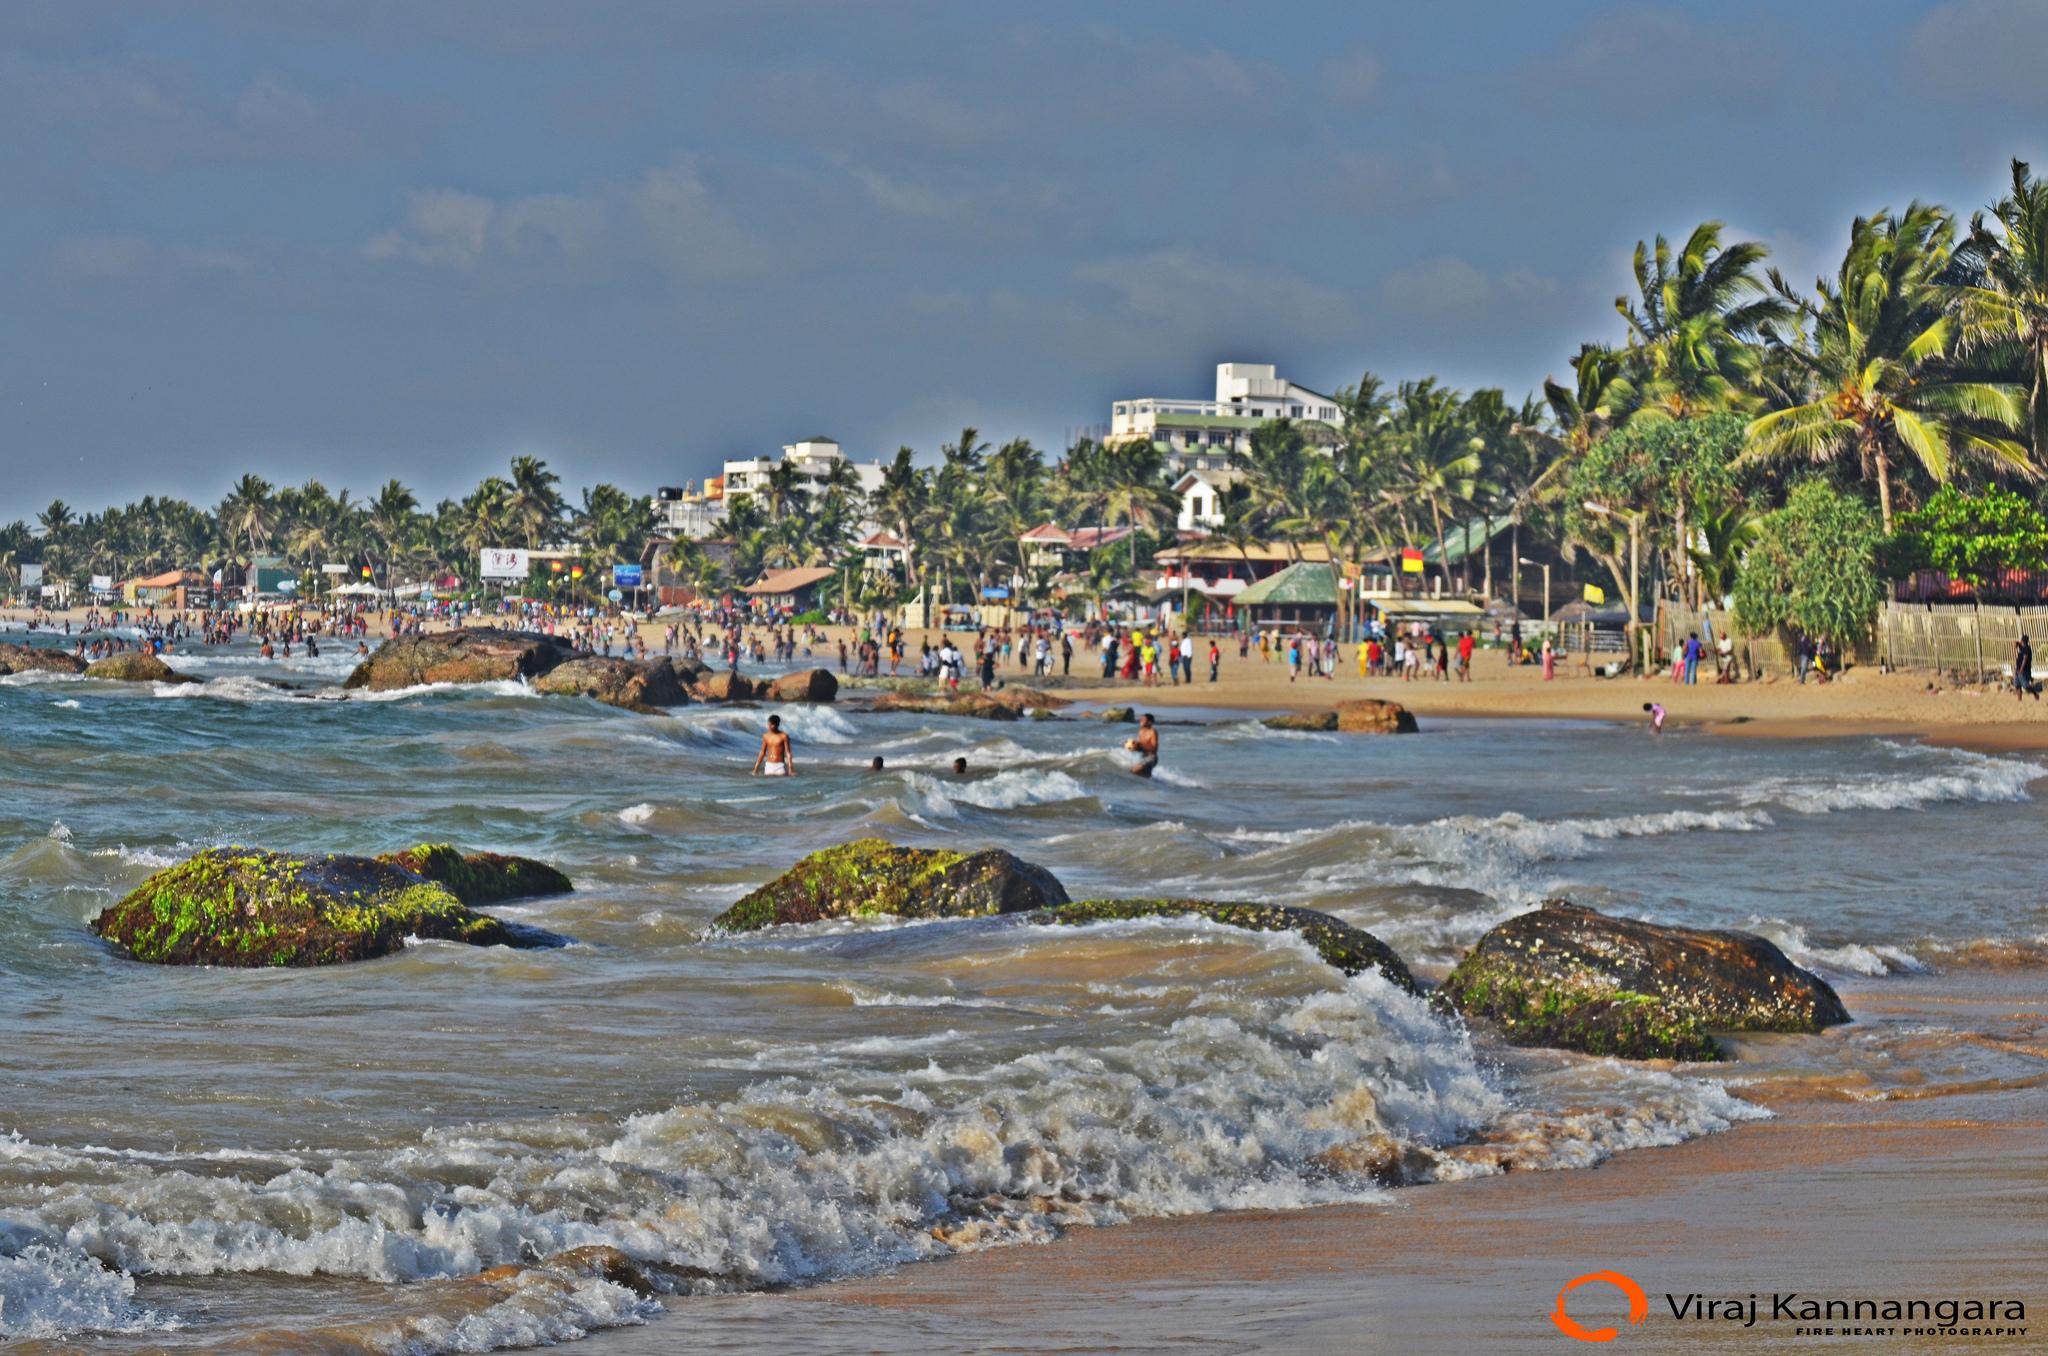 Dehiwala Mount Lavinia Beach To Visit In Sri Lanka - Traveller Location